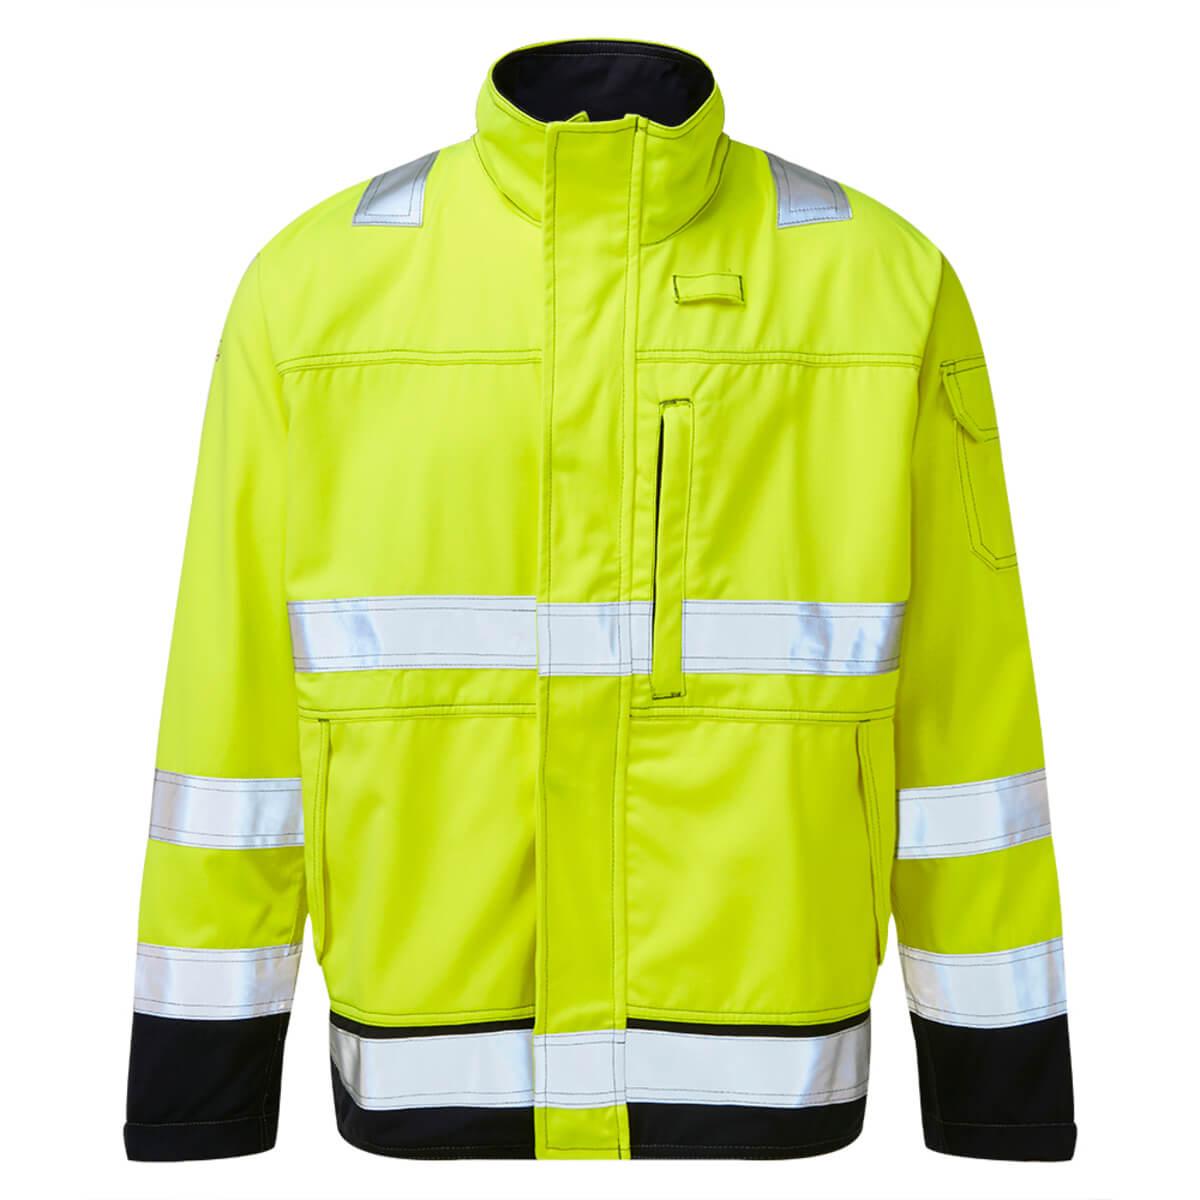 HAZTEC® Mondo Flame Resistant Anti-Static Hi-Vis Inherent Driver Jacket Yellow Front